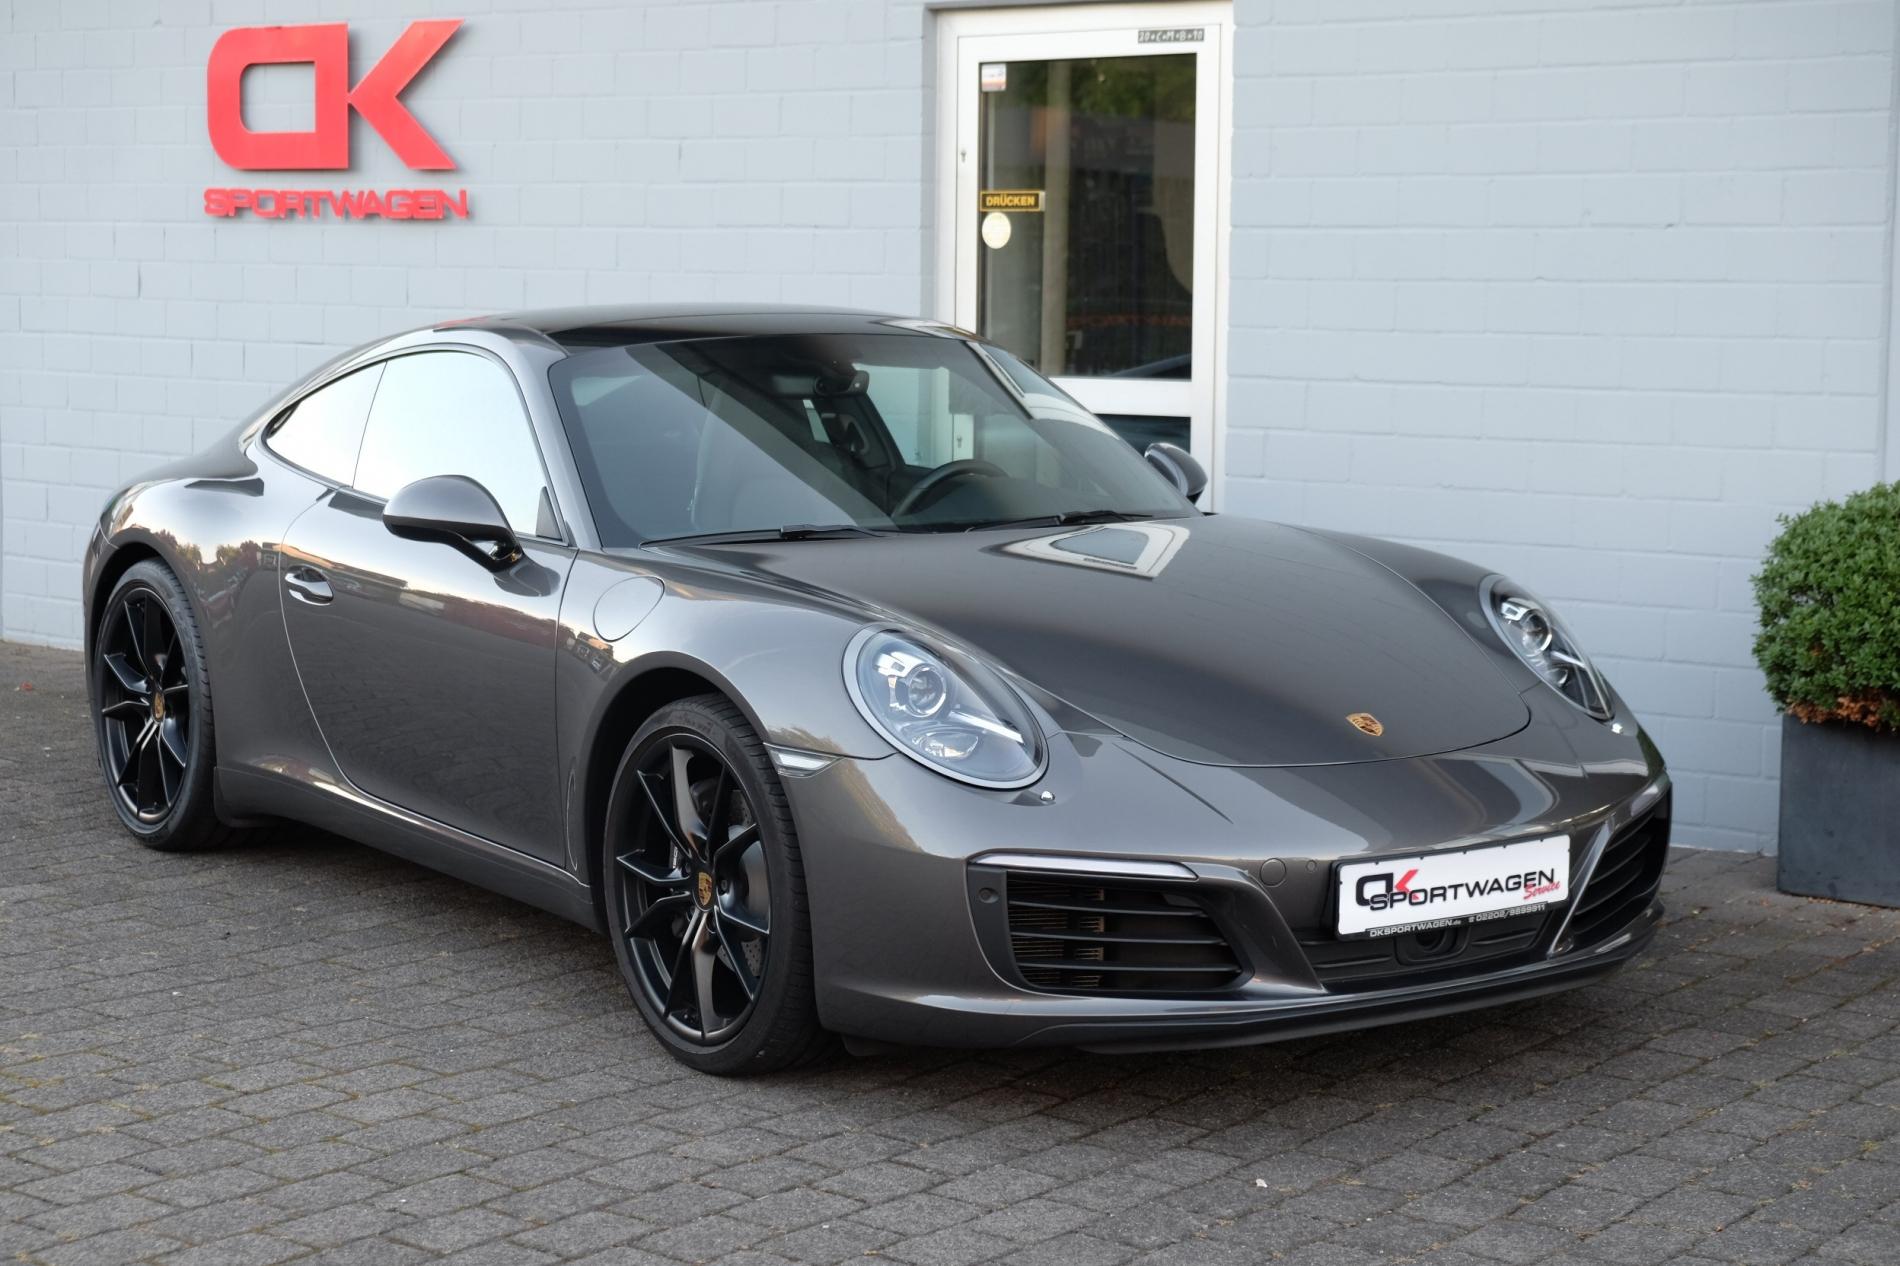 Porsche 991.2 Carrera